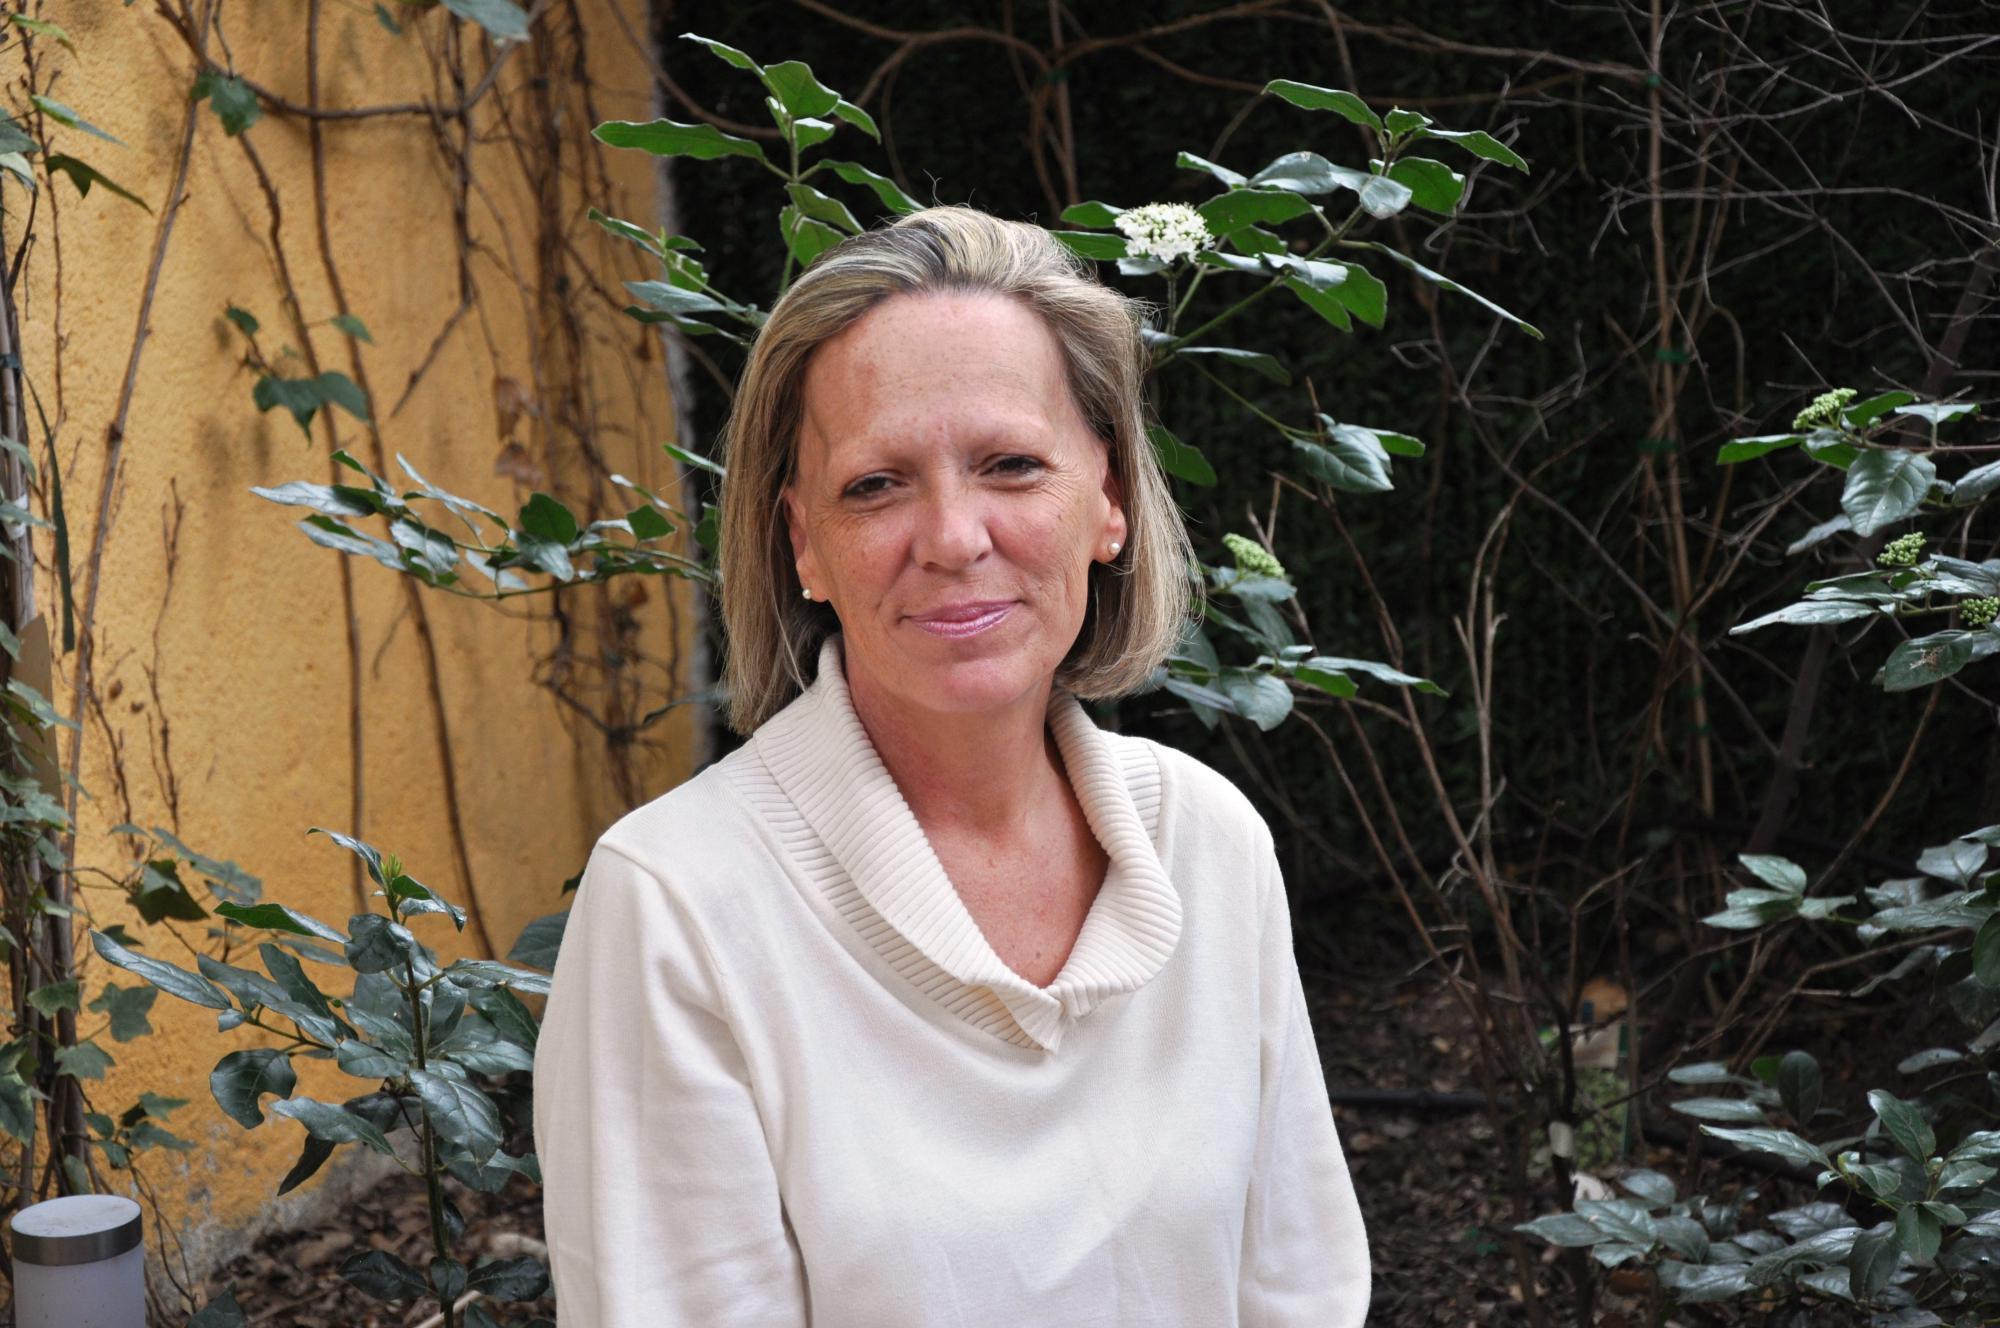 Fallece Teresa Díez, delegada de UPyD en Torrelodones